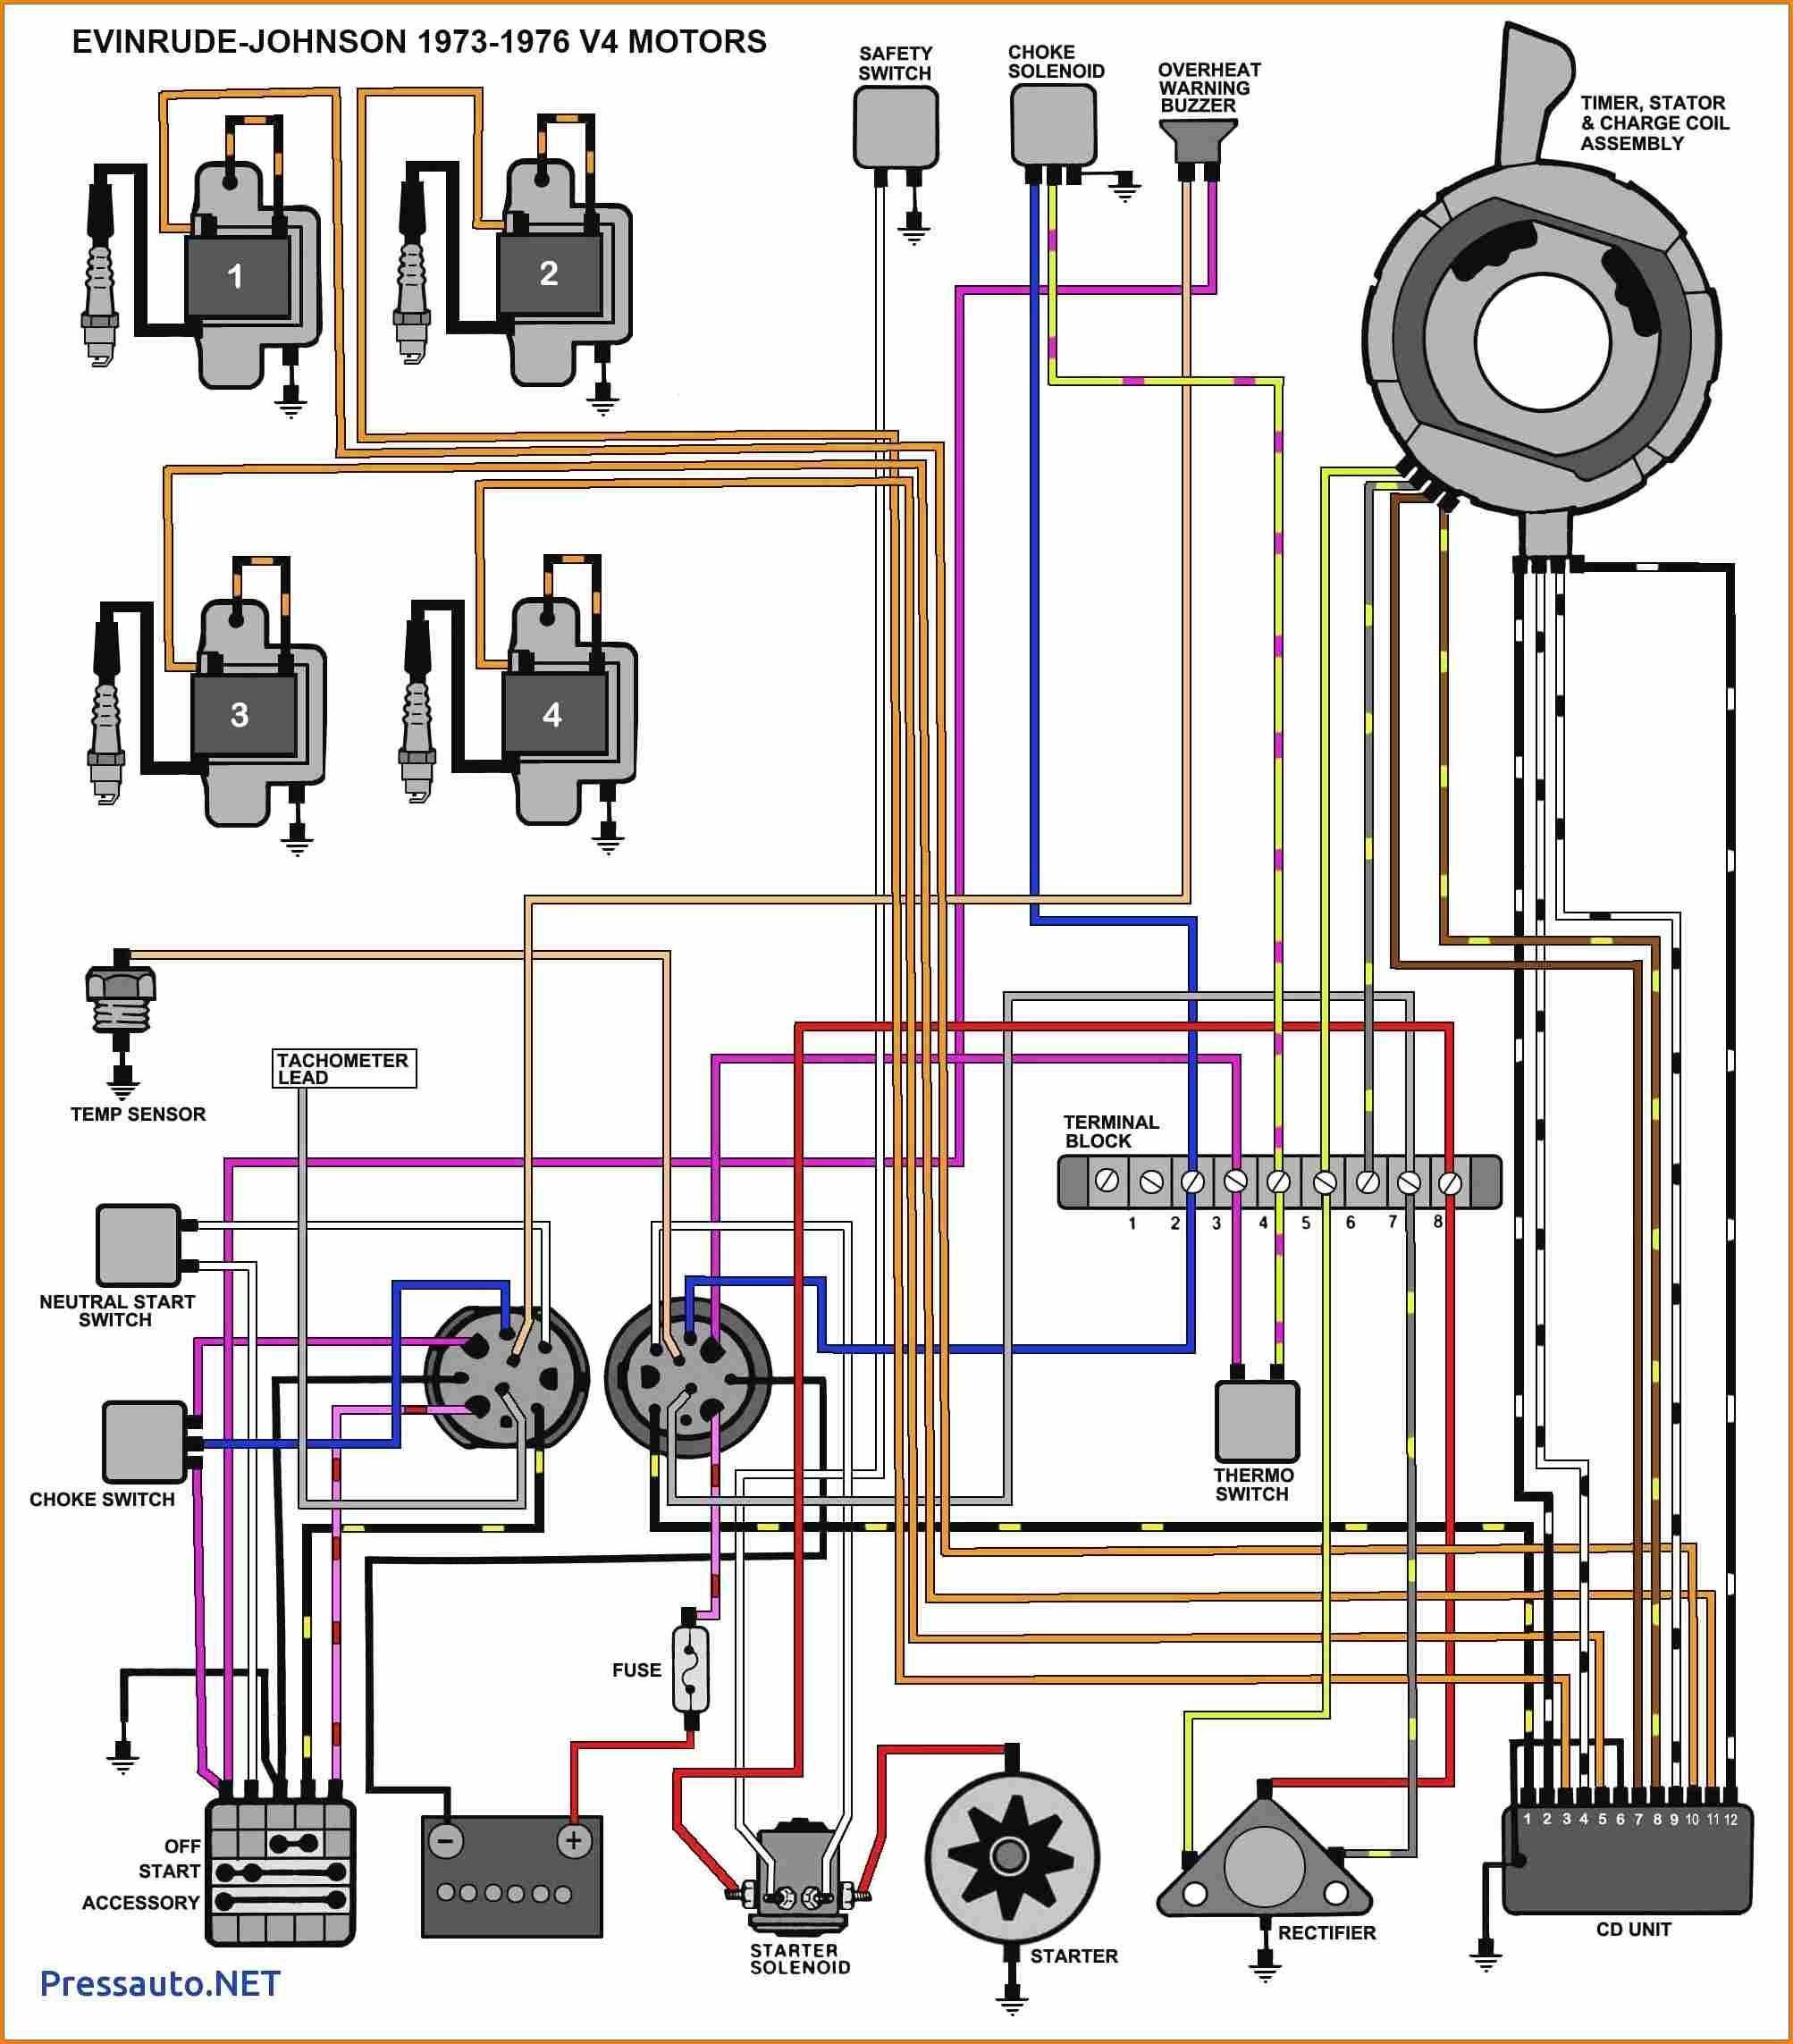 1996 evinrude wiring diagram diy wiring diagrams u2022 rh aviomar co Johnson  40 HP Outboard Manual